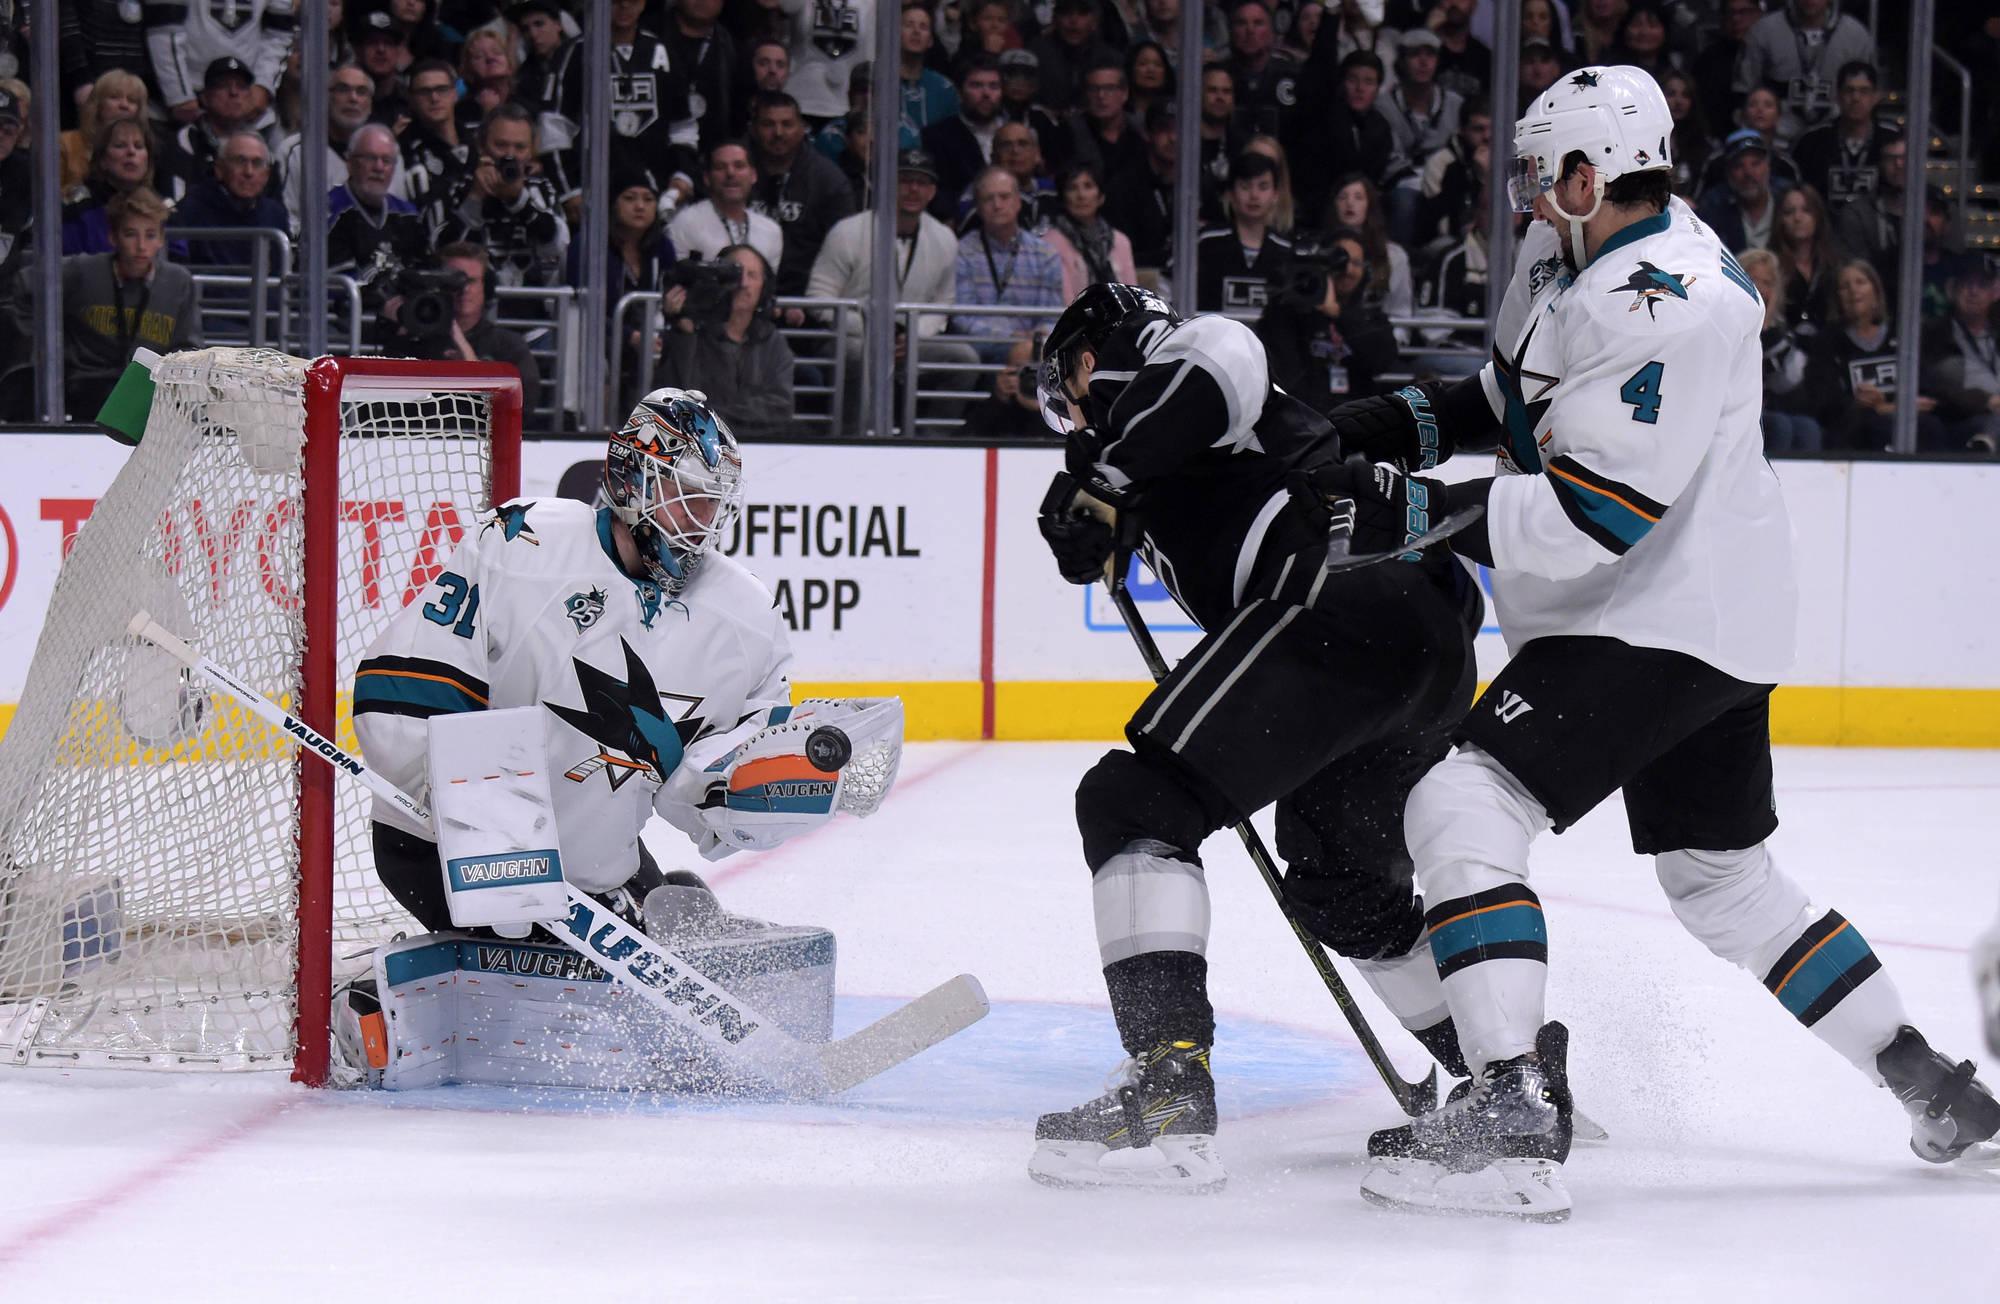 Los Angeles Kings at San Jose Sharks: Recap